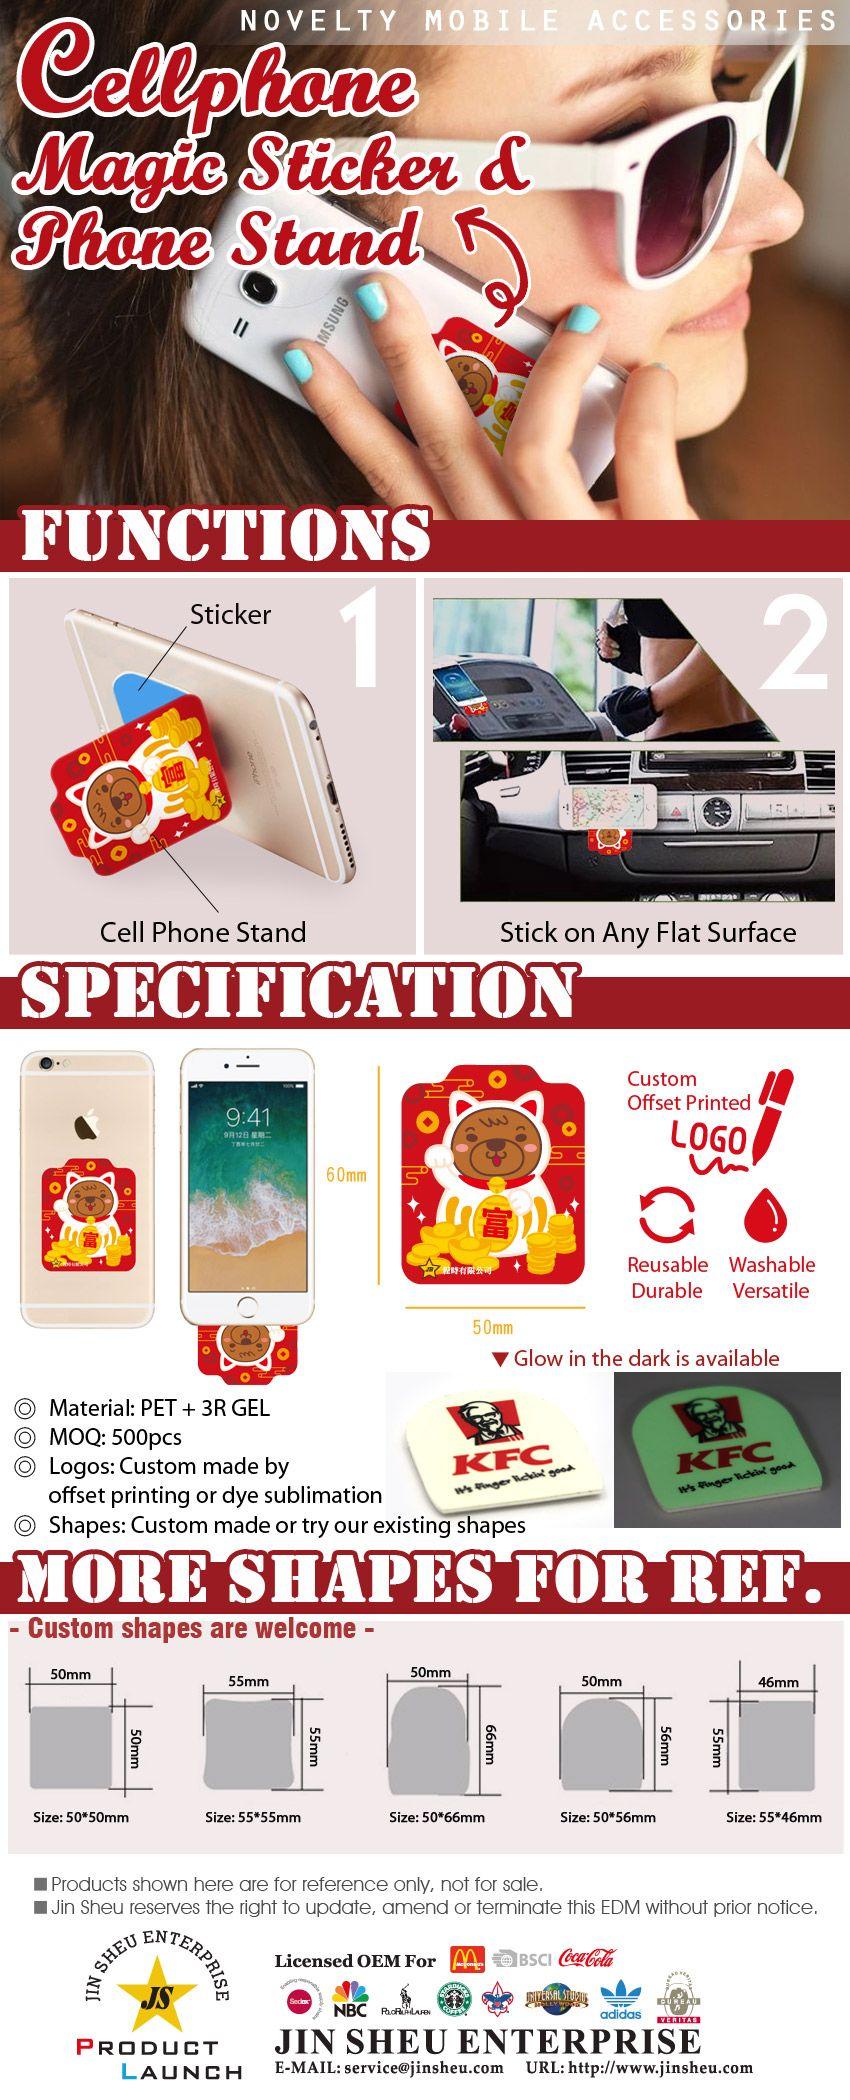 Cellphone Magic Sticker & Phone Stand